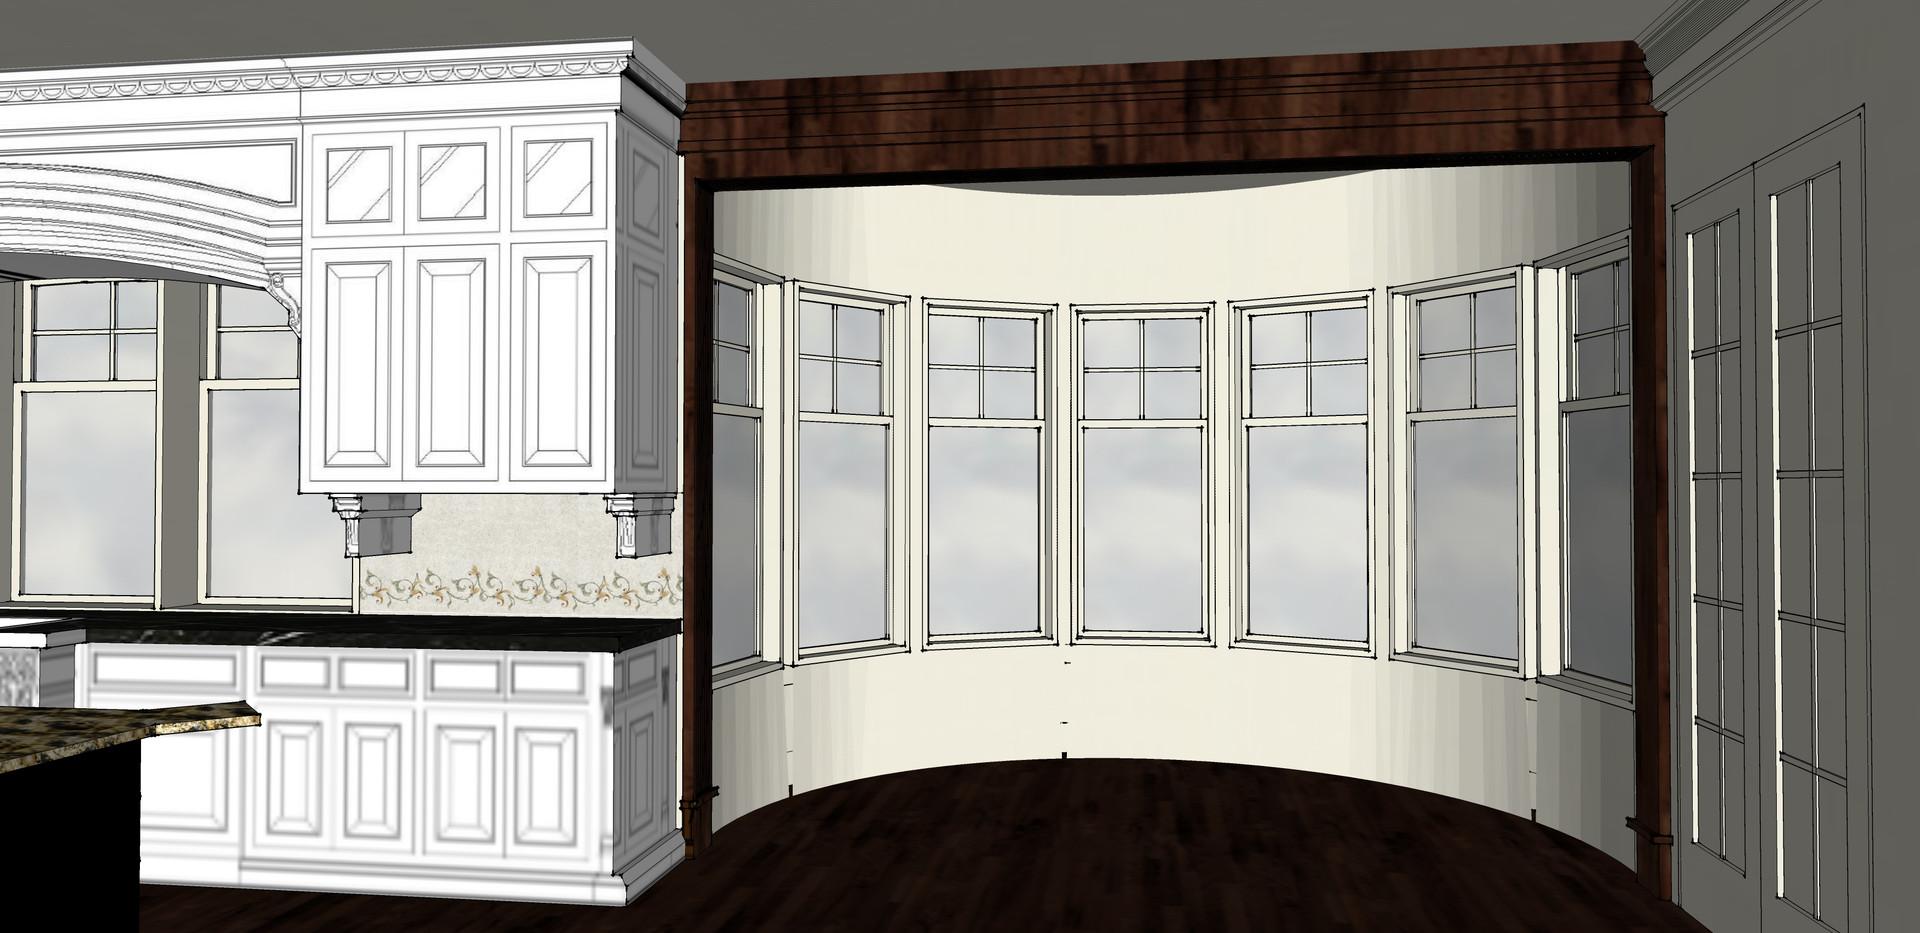 Kitchen Casing Bar & Library Sketch Italianate Skaneatleles _Ramsgard